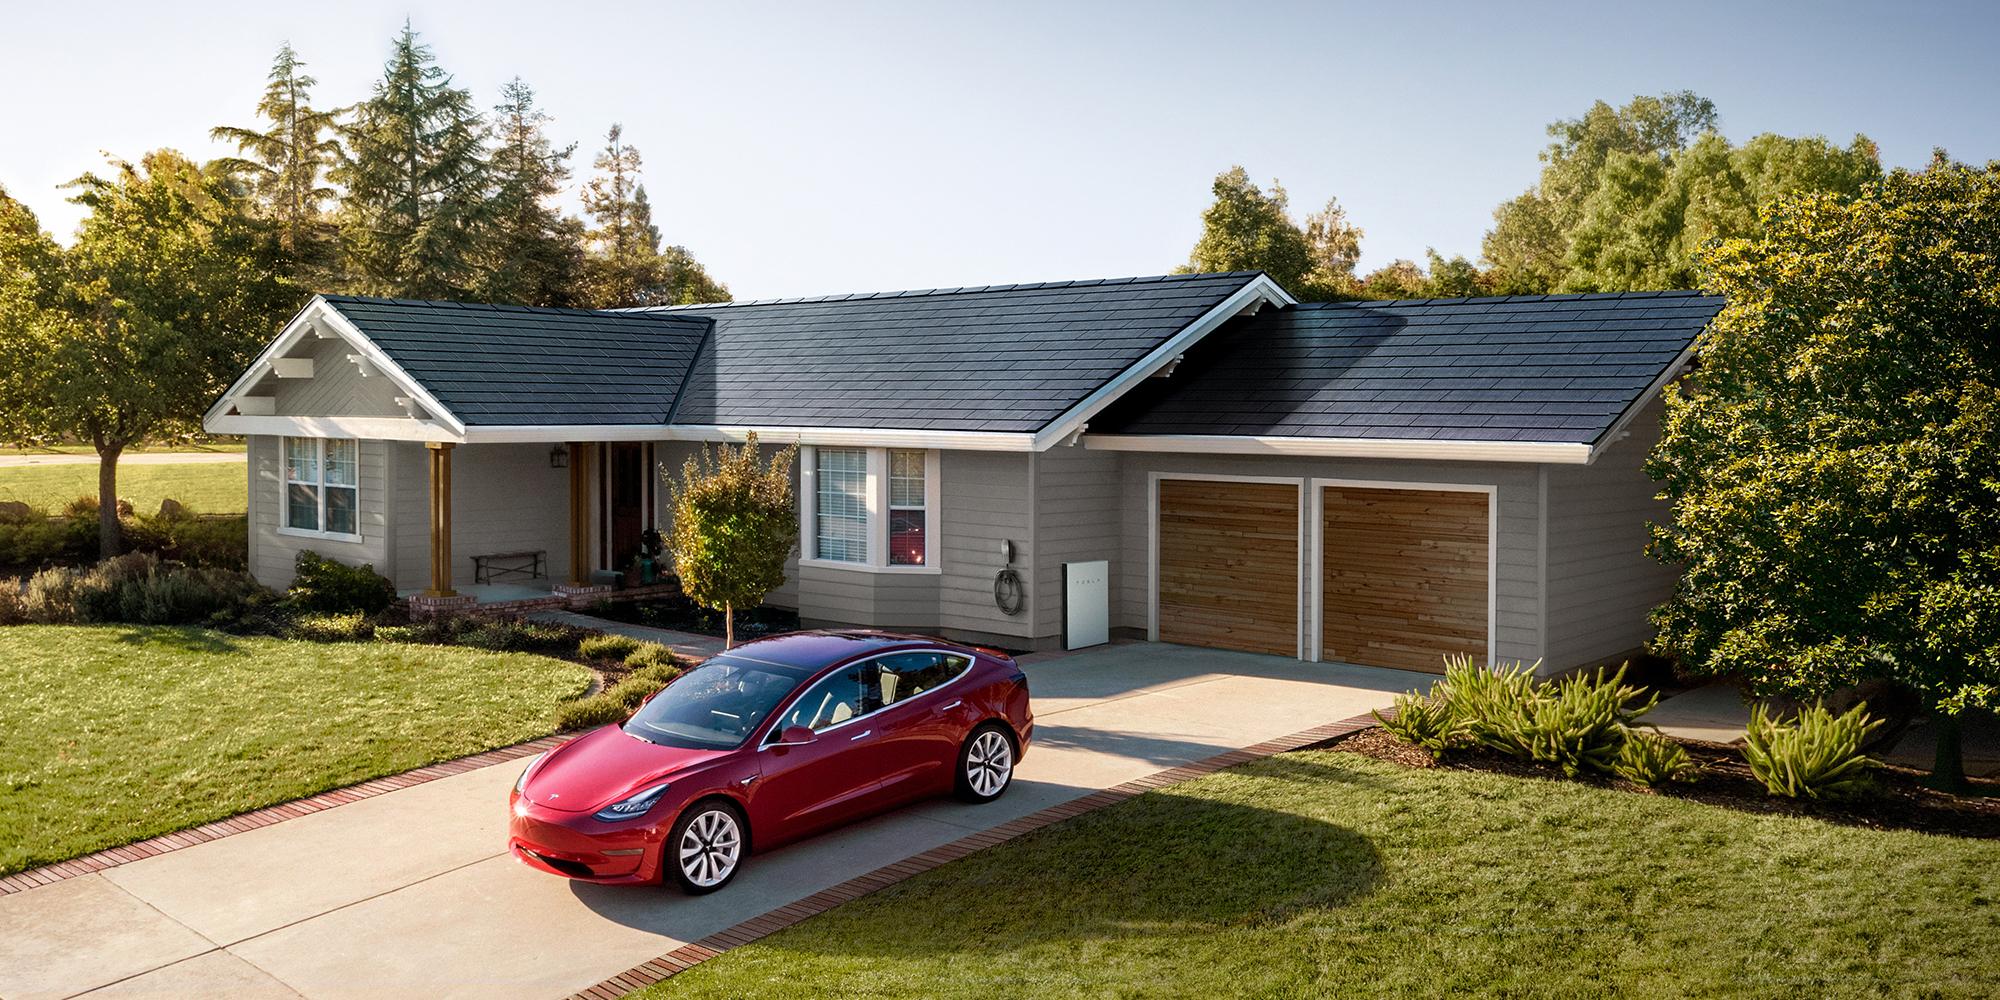 https://i0.wp.com/electrek.co/wp-content/uploads/sites/3/2021/05/Tesla-Guide-Solar-Roof-Hero.jpg